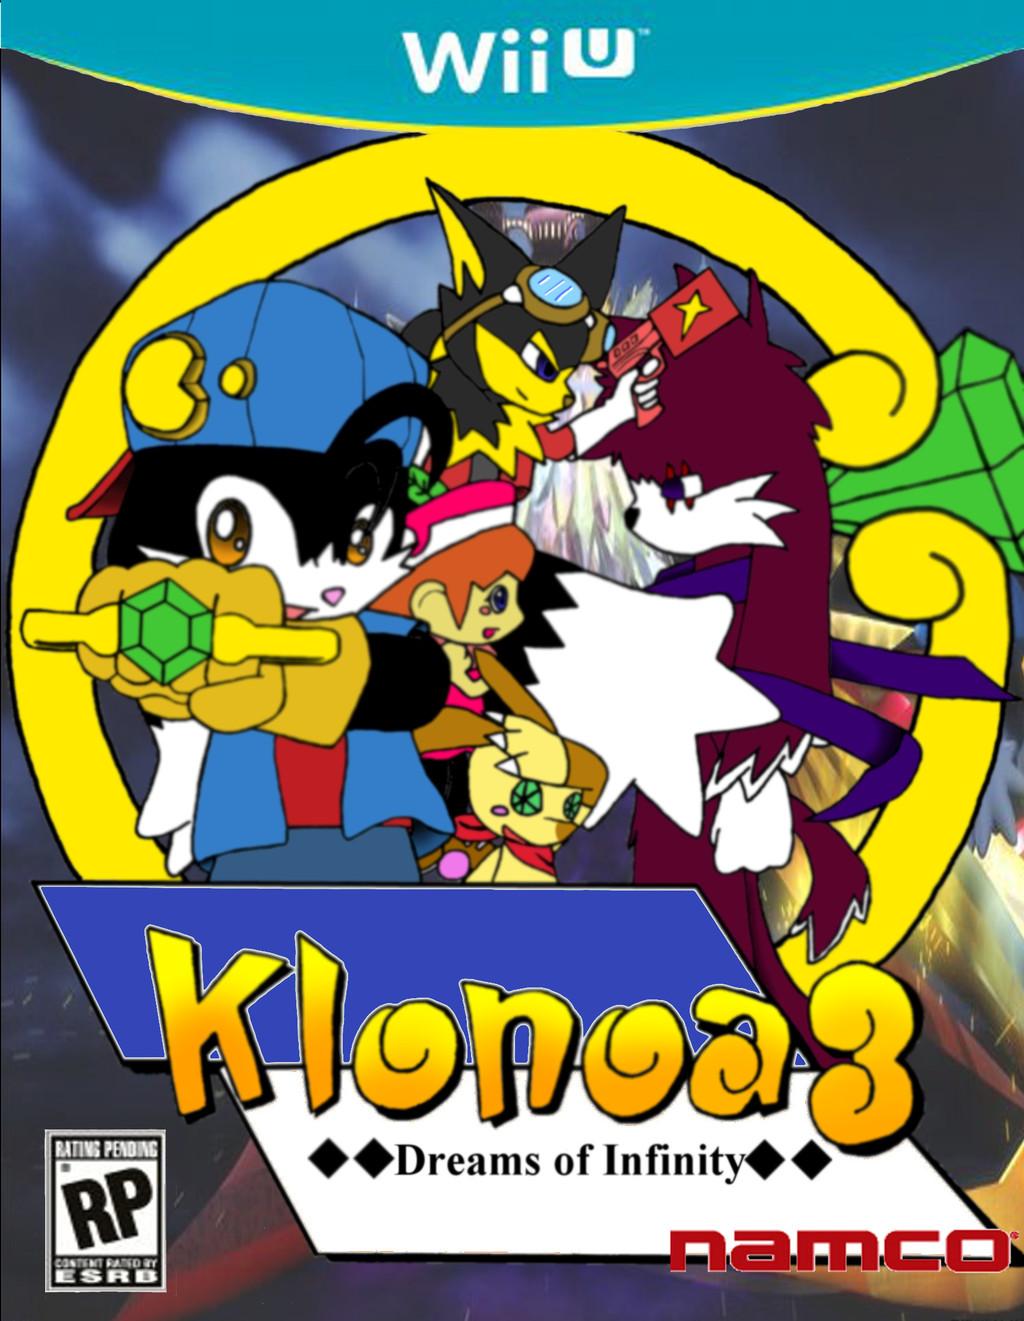 Klonoa 3: Dreams of Infinity